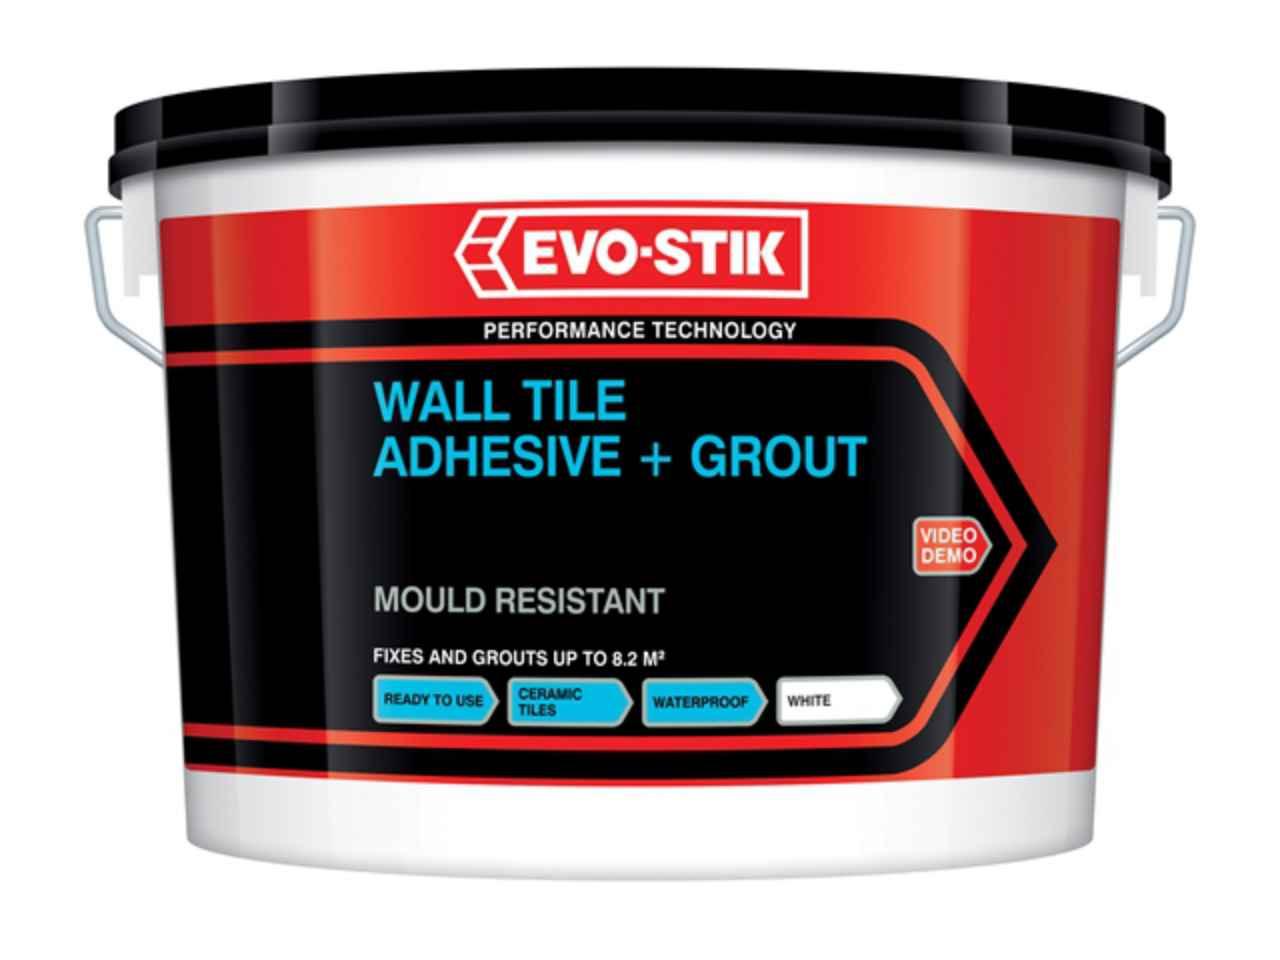 Sealants Glues Adhesives Tile Adhesive Sealant